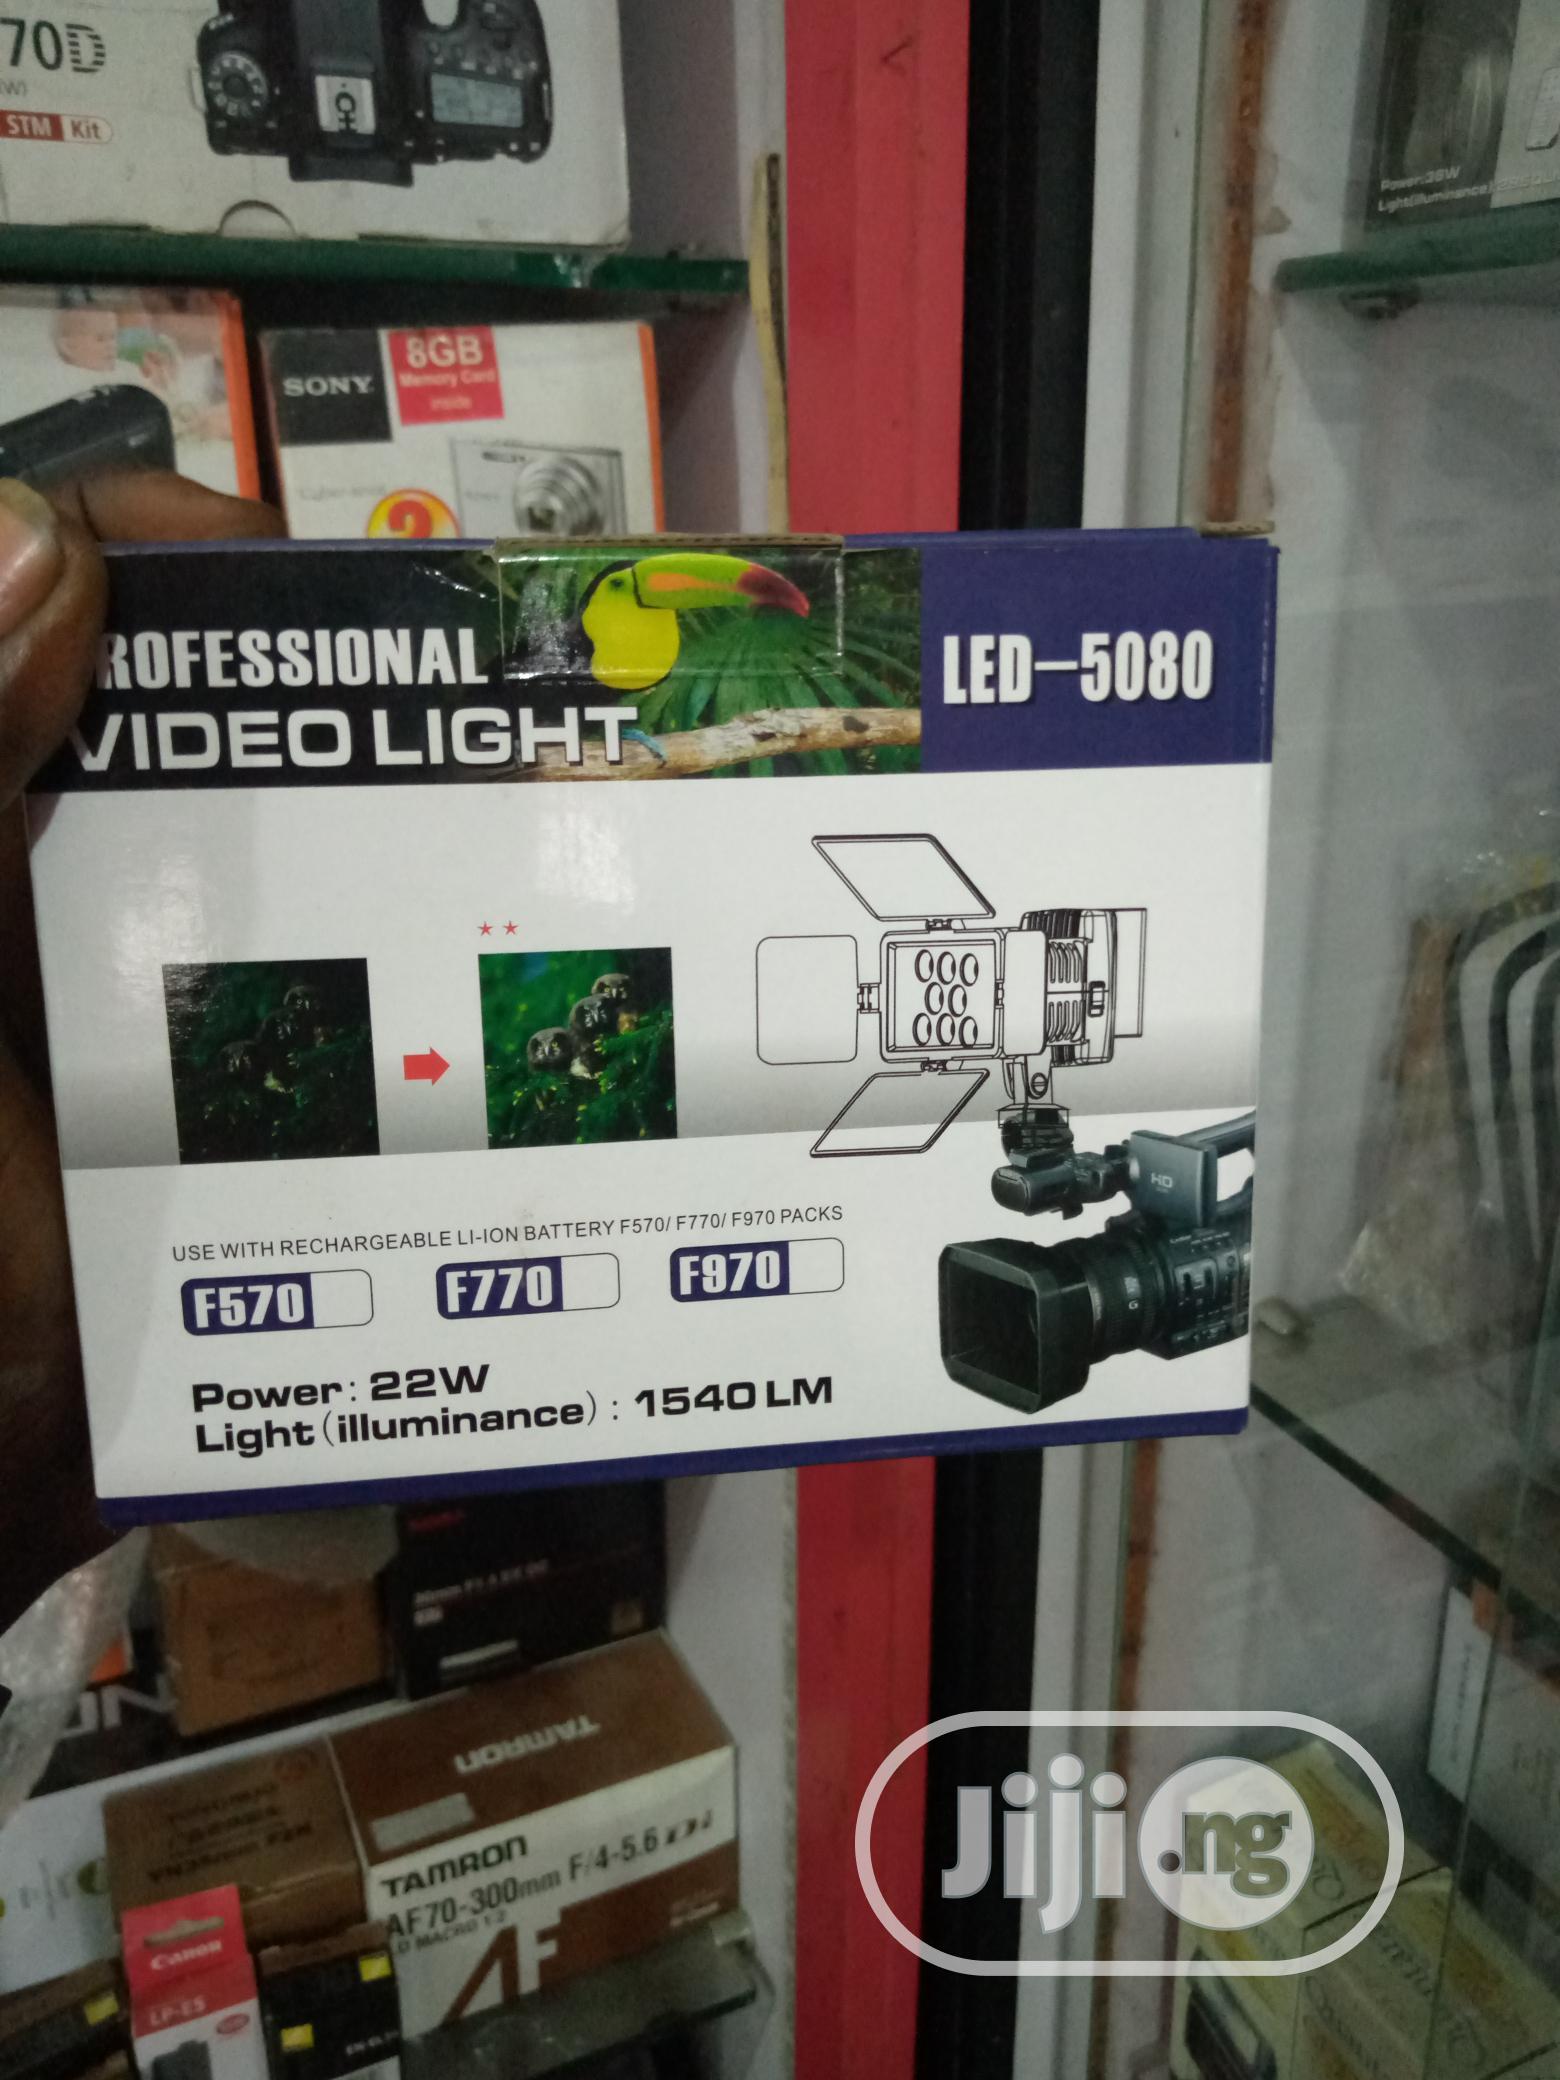 LED Video Light 5080